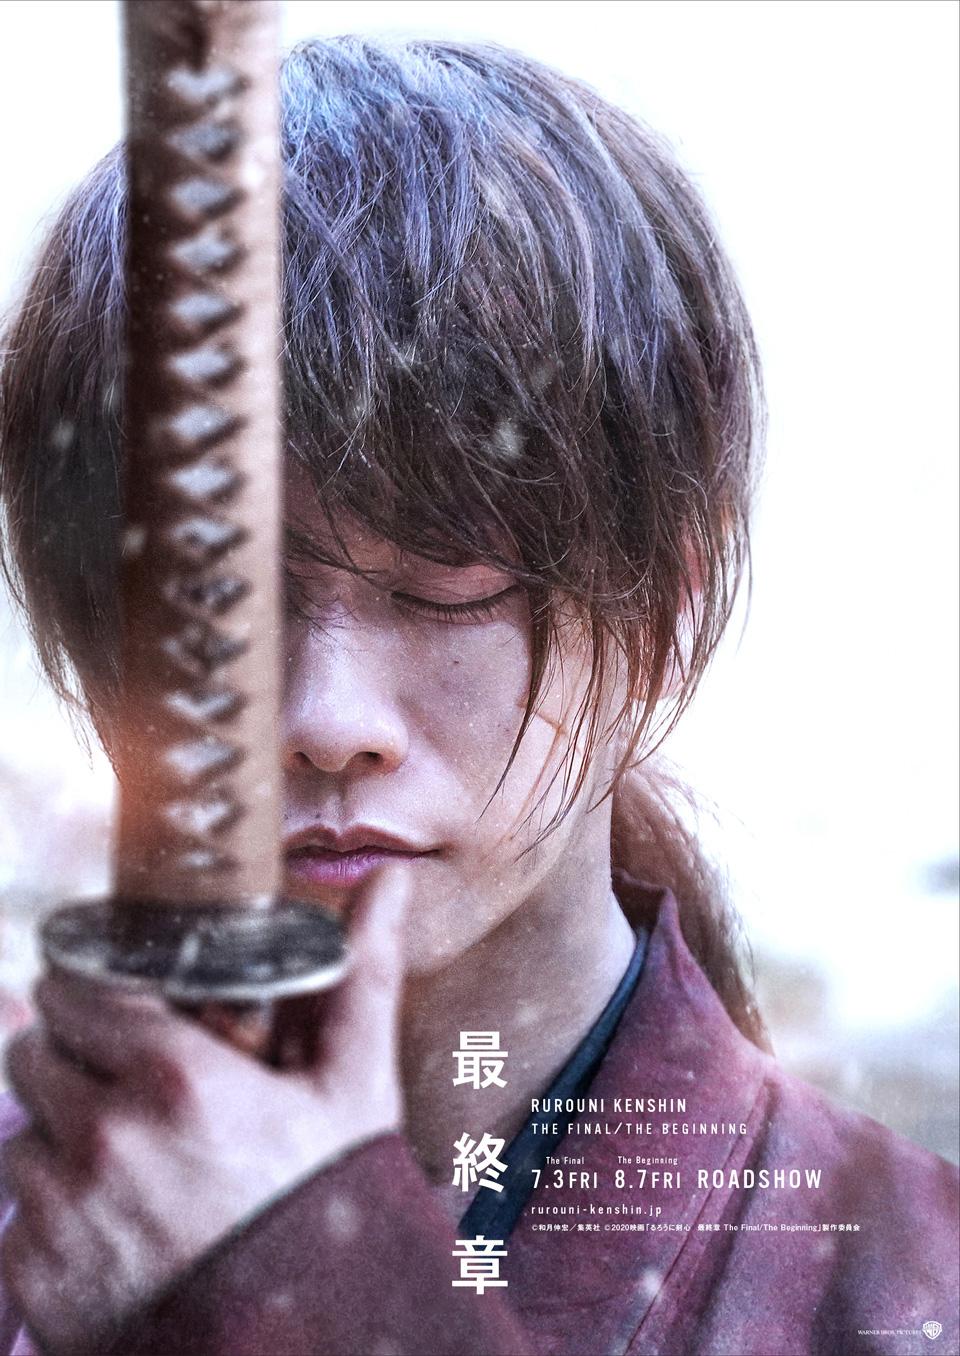 Imagem promocional dos últimos dois filmes live-action de Rurouni Kenshin